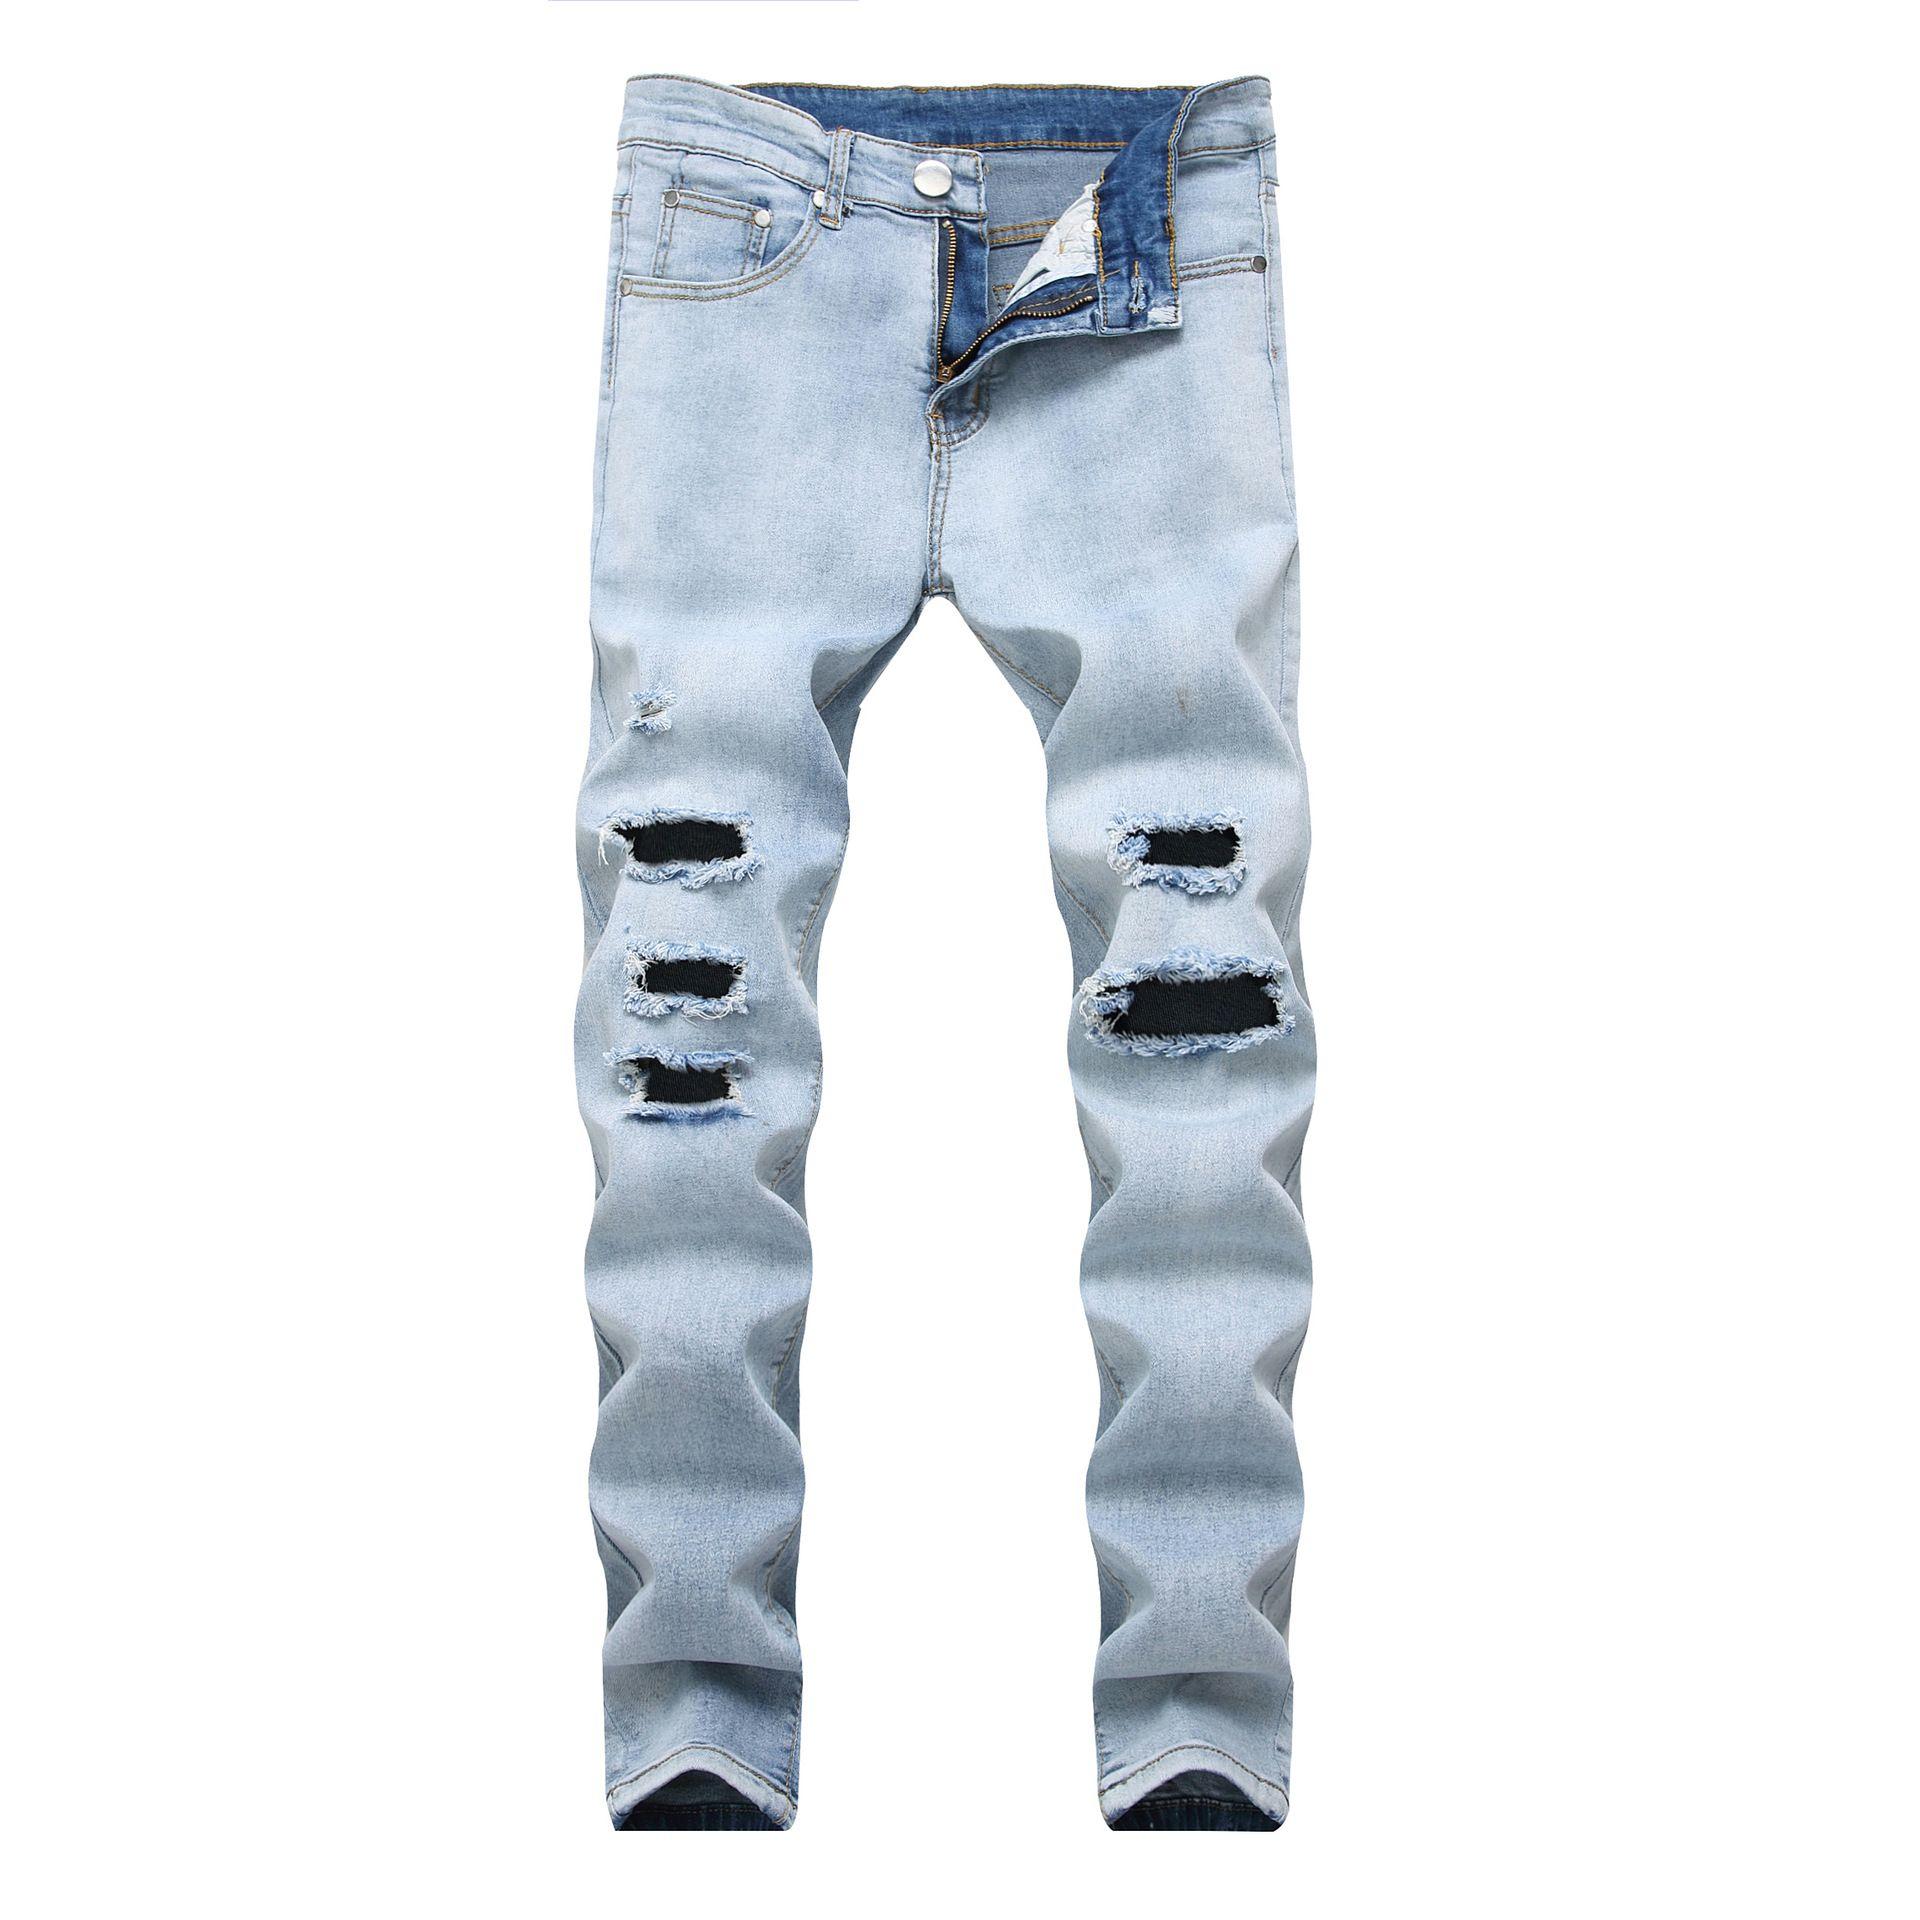 624f272468609 2019 Sky Blue Ripped Jeans Men Autumn Brand Hip Hop Mens Skinny Jeans Homme  Slim Fit Biker Jeans Pants J180719 From Janet1221